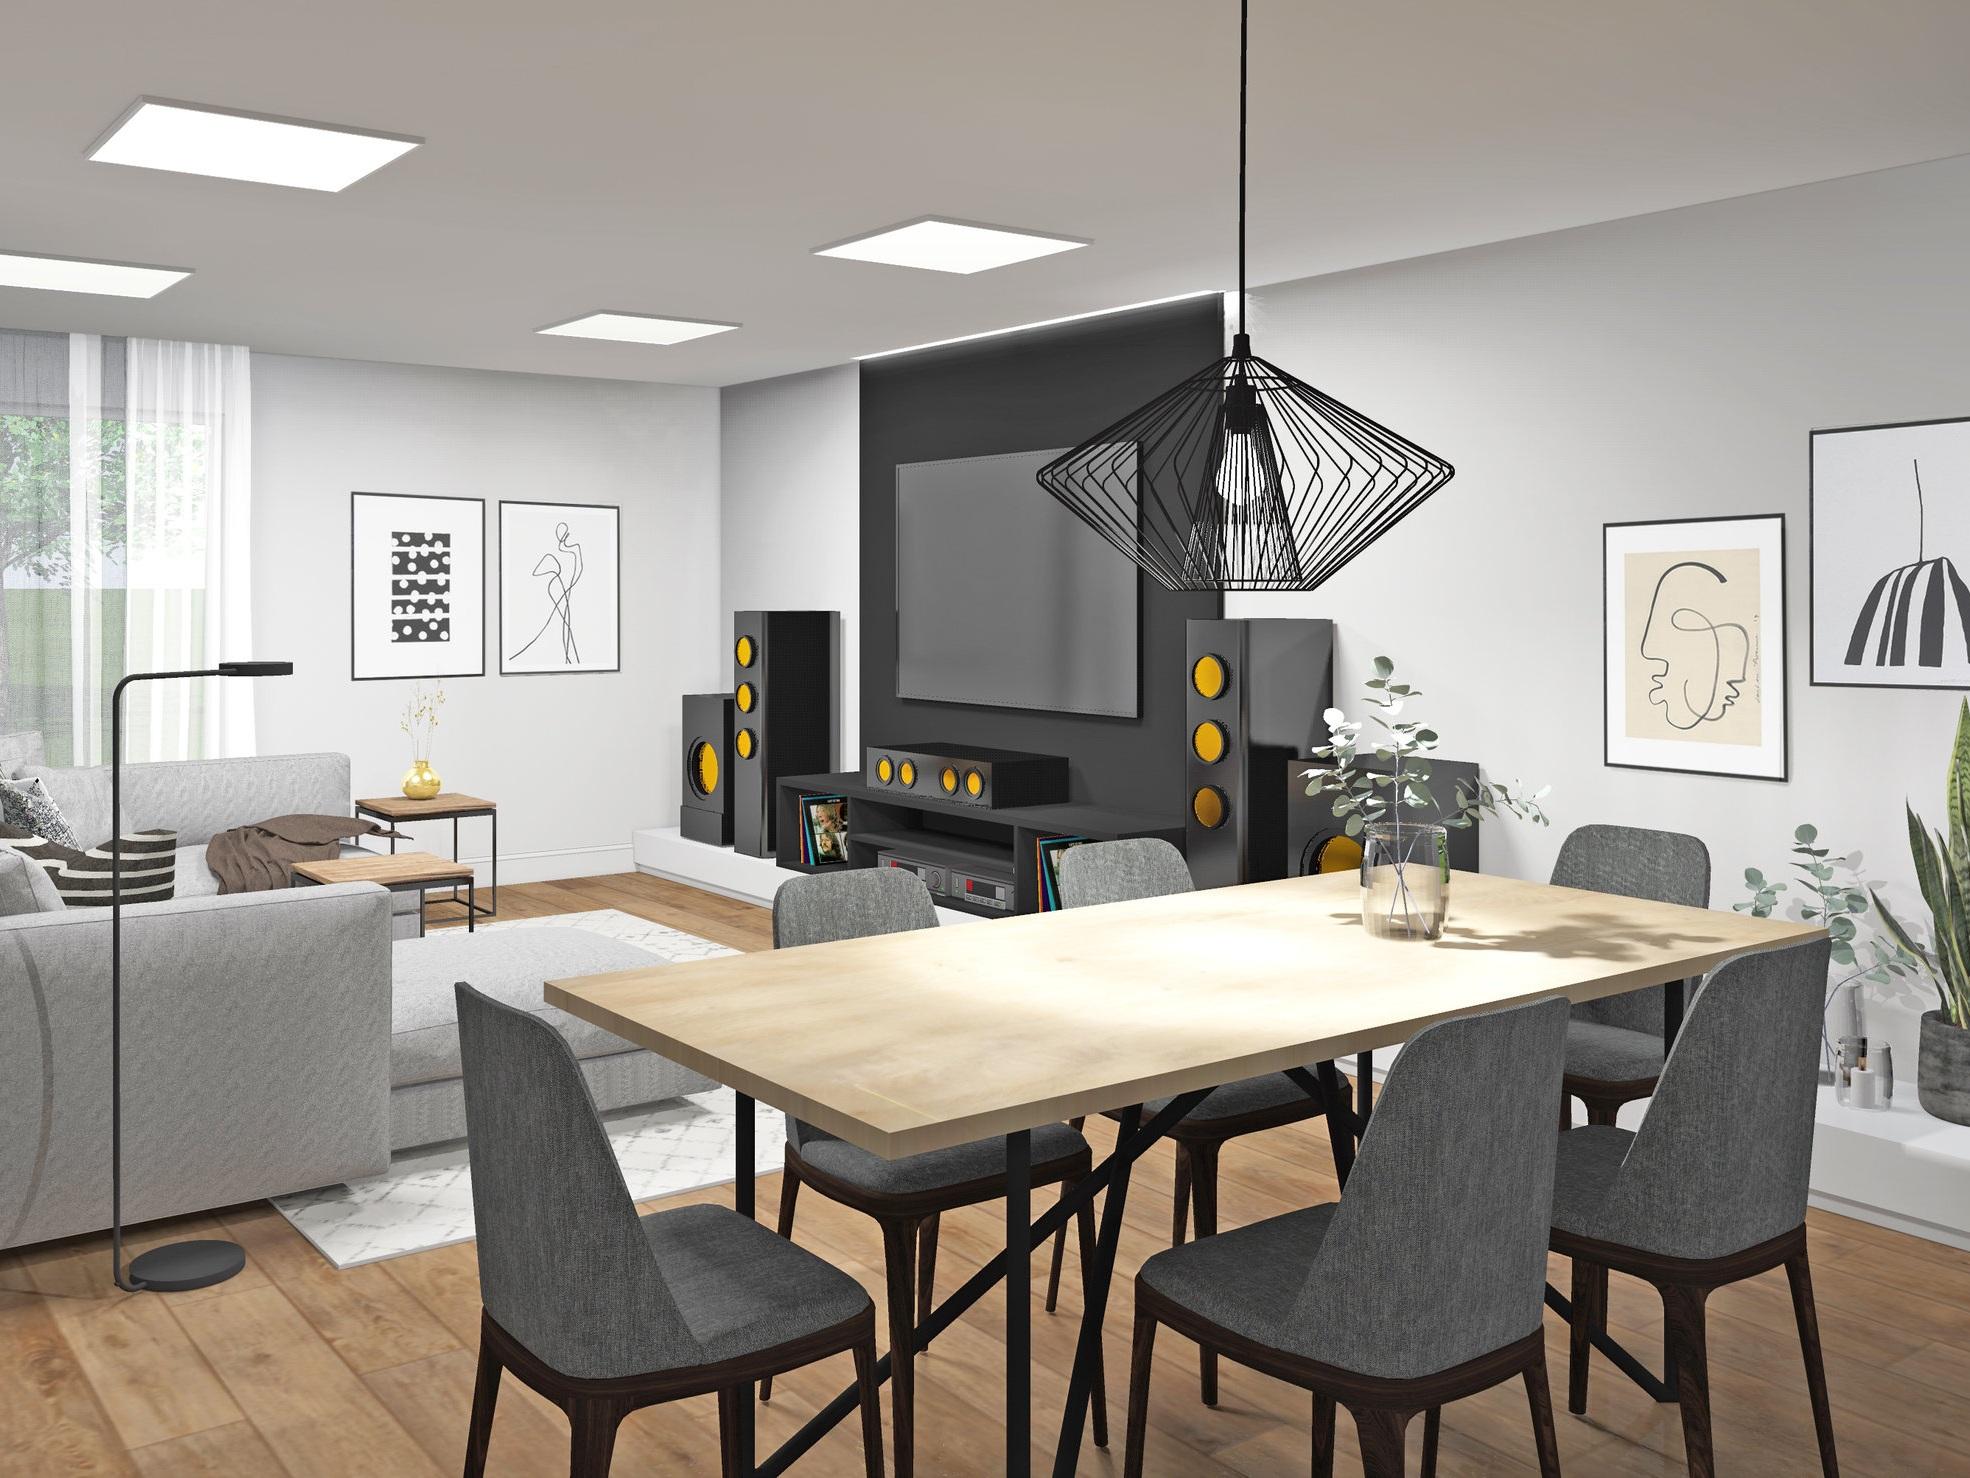 HOUSE POHORJE - interior design